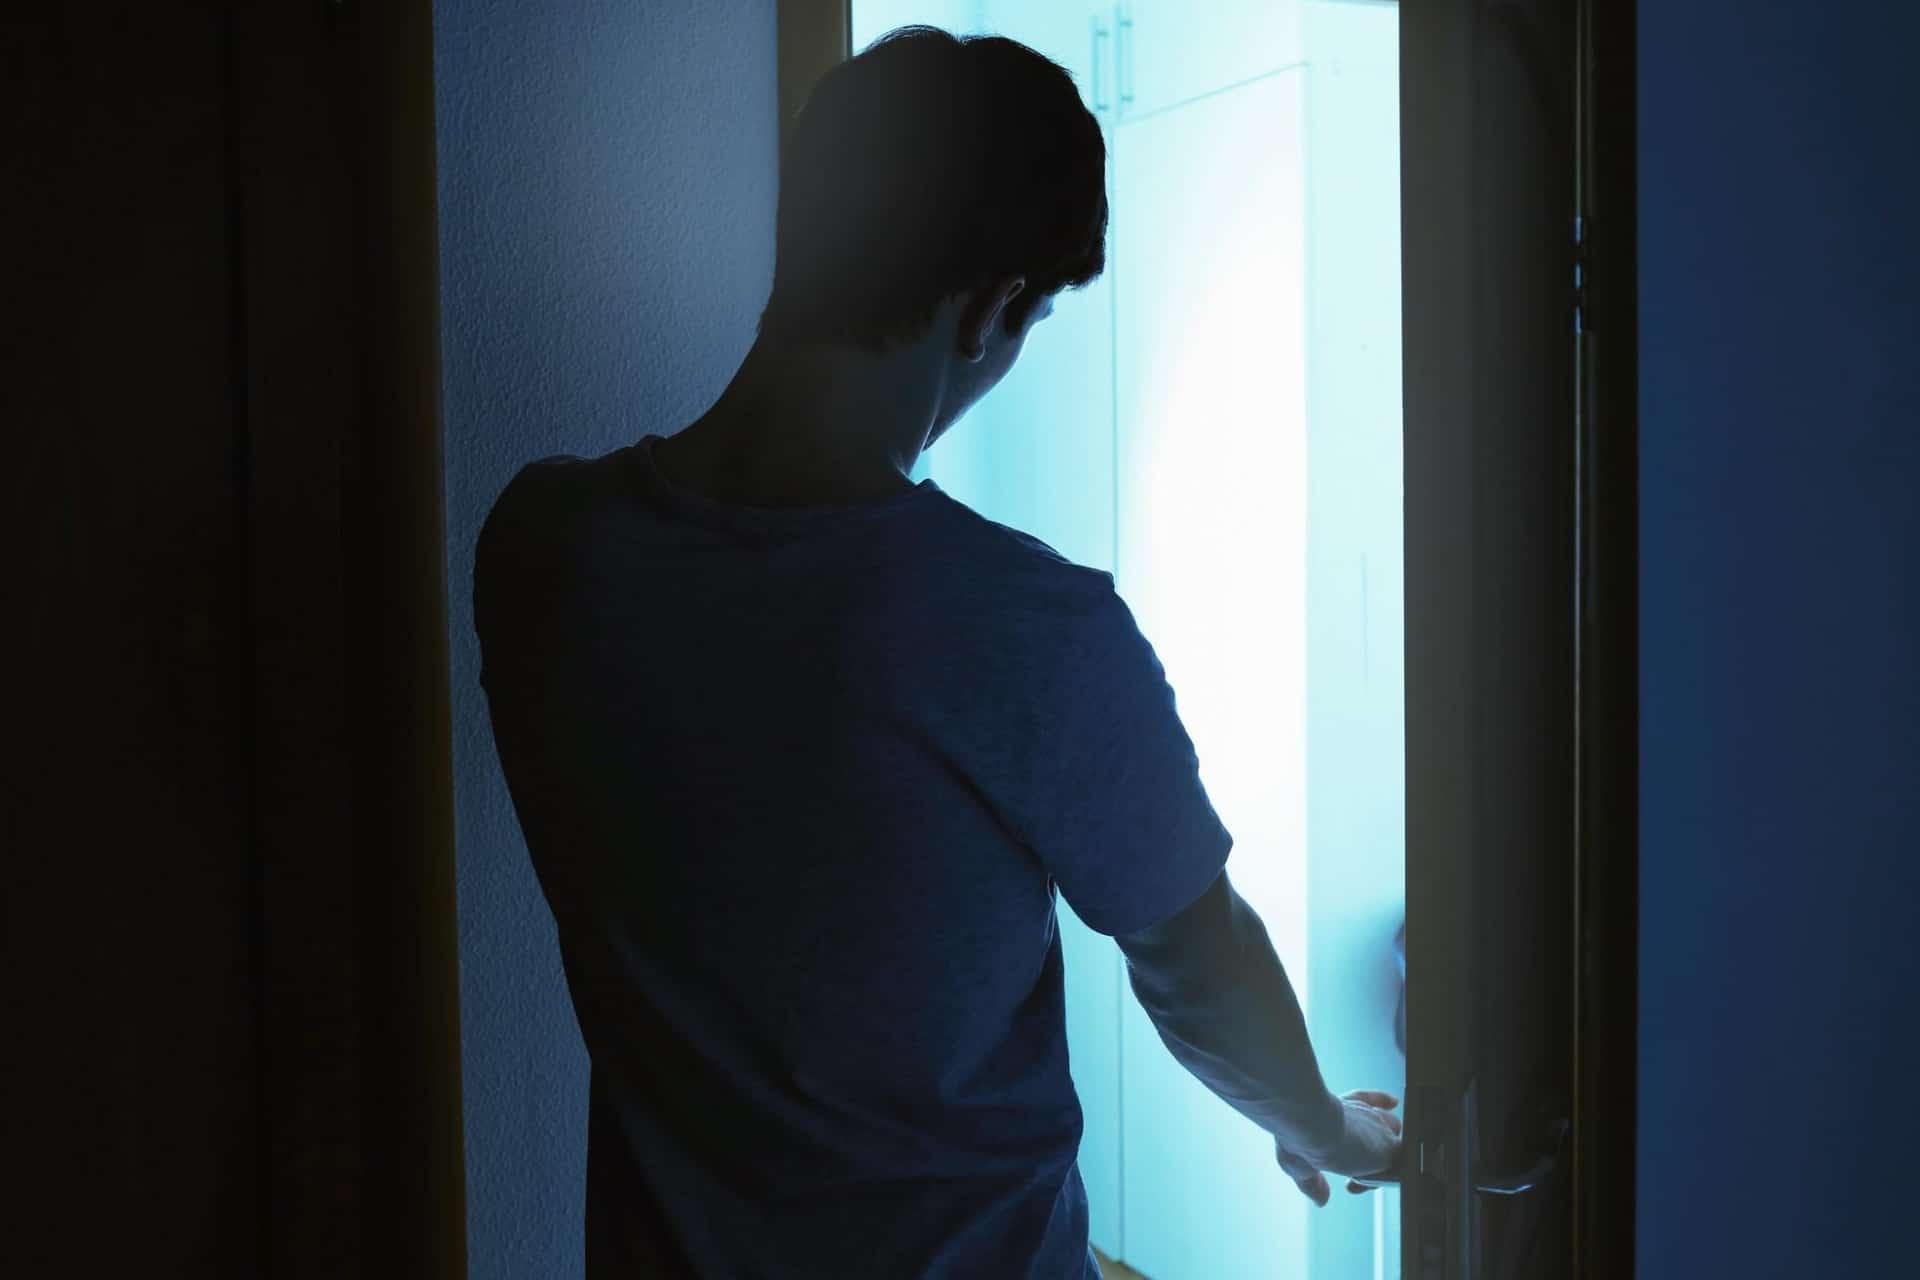 Man walks around bedroom while sleeping.